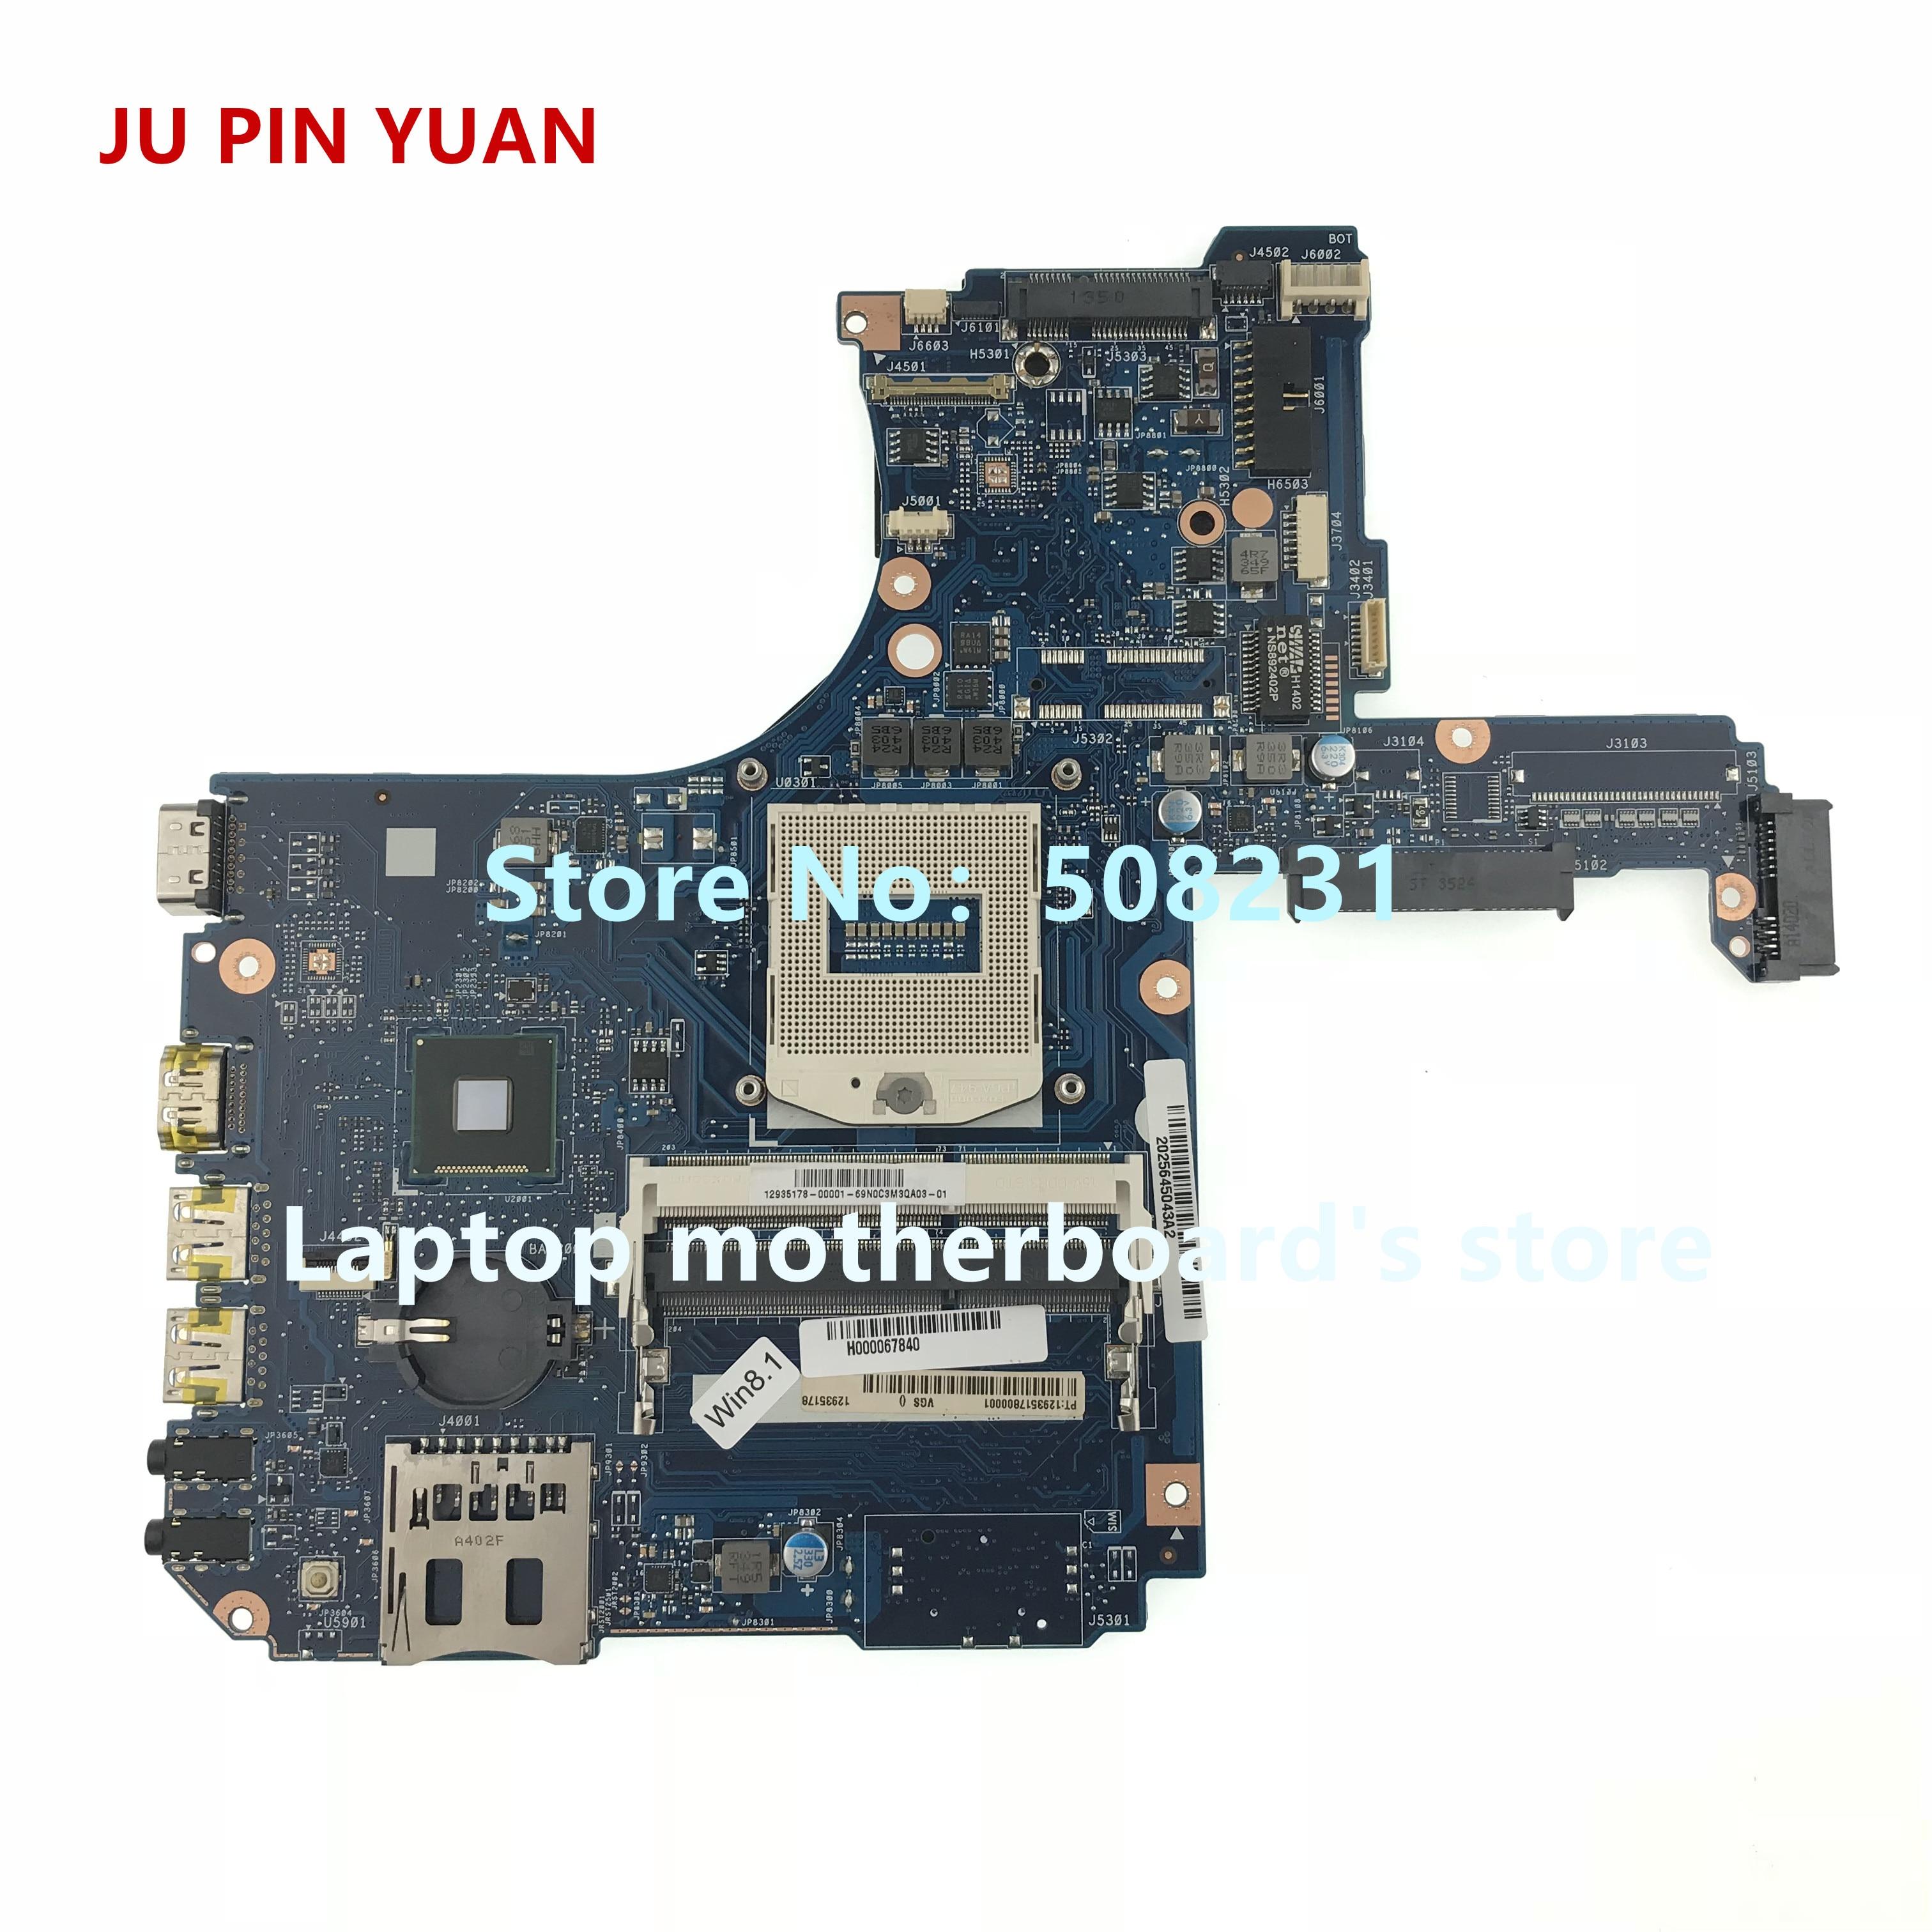 JU PIN YUANS Pour Toshiba Satellite L50-A L55-A mère d'ordinateur portable H000067840 carte mère socket PGA 947 HM86 DDR3L